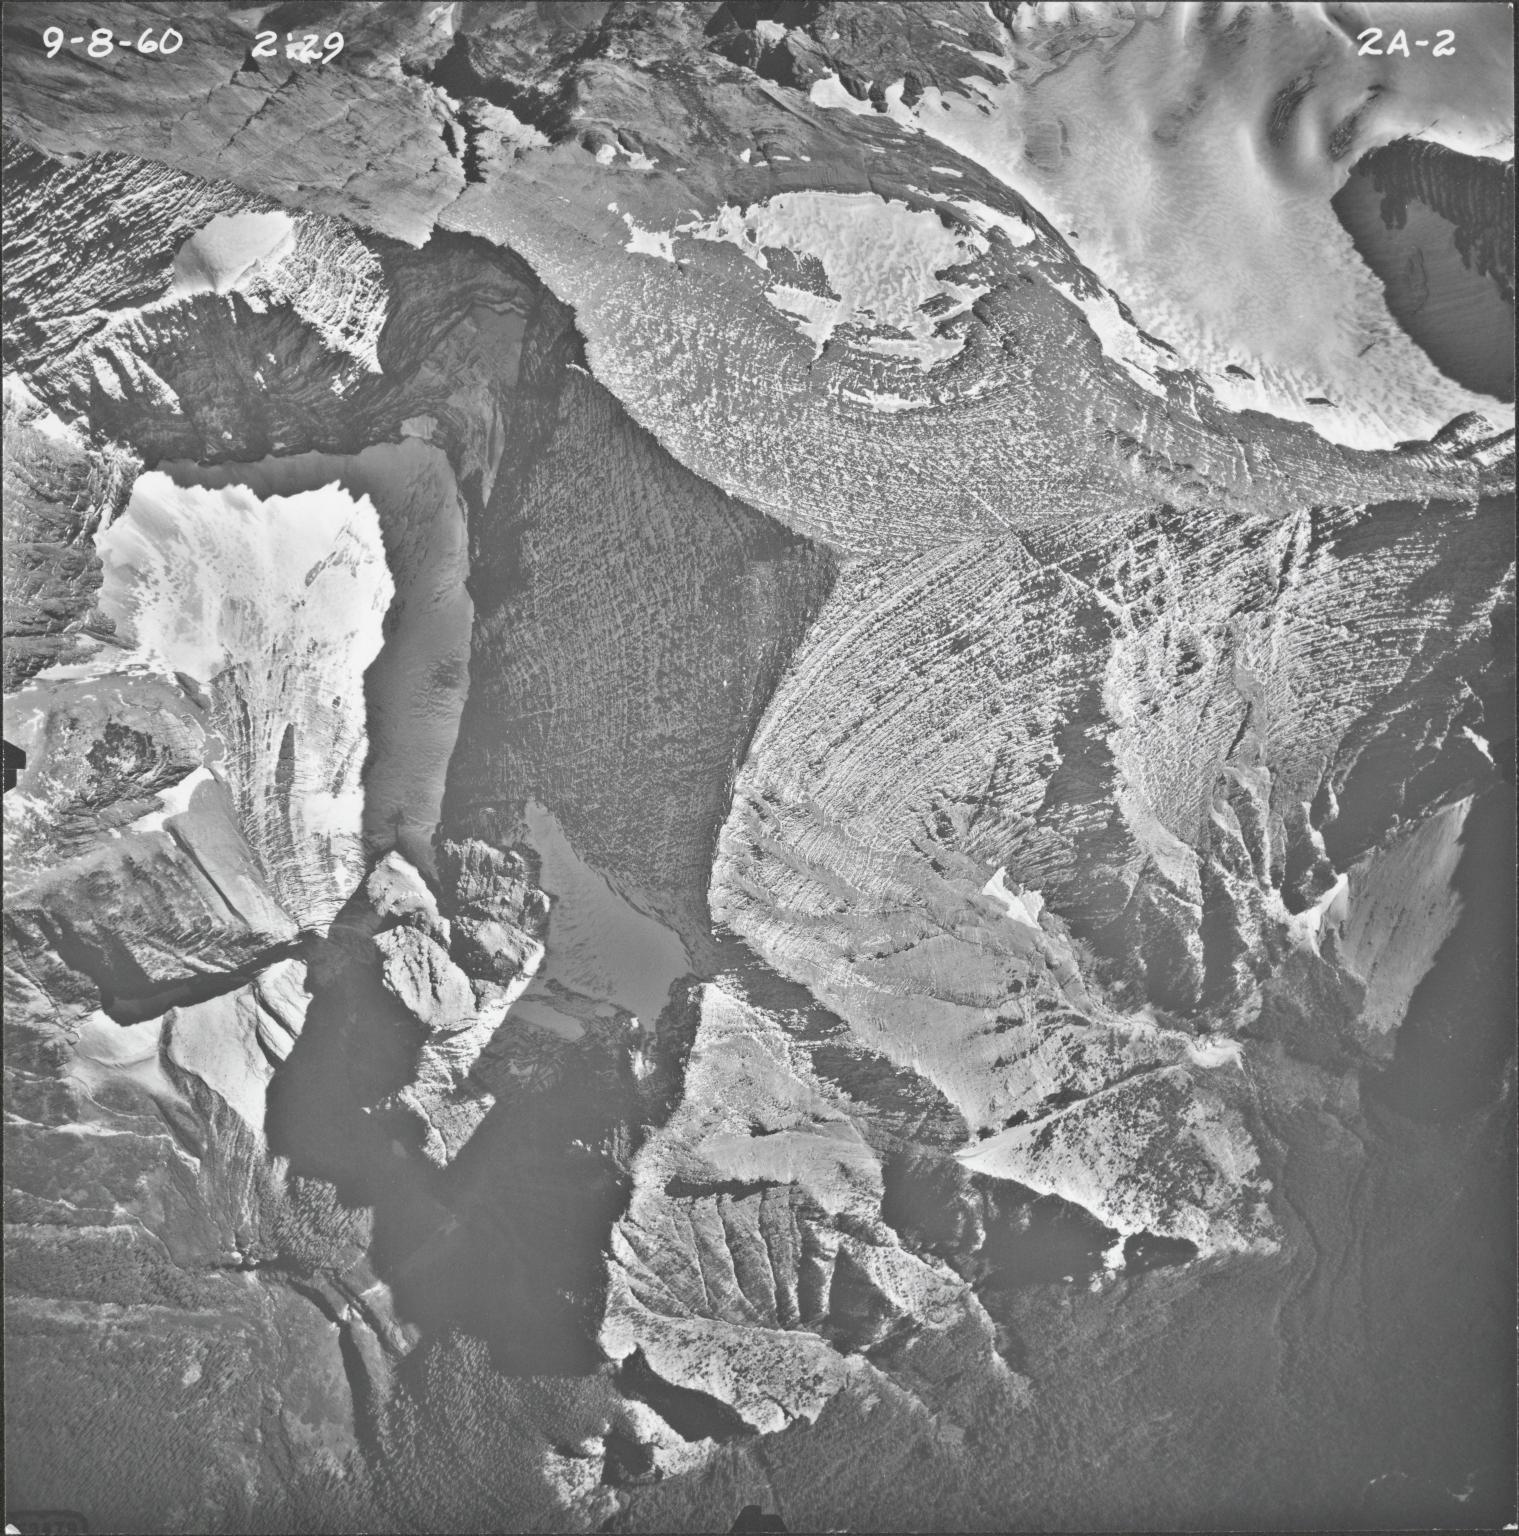 Rainbow Glacier, aerial photograph FL2A-2, Montana